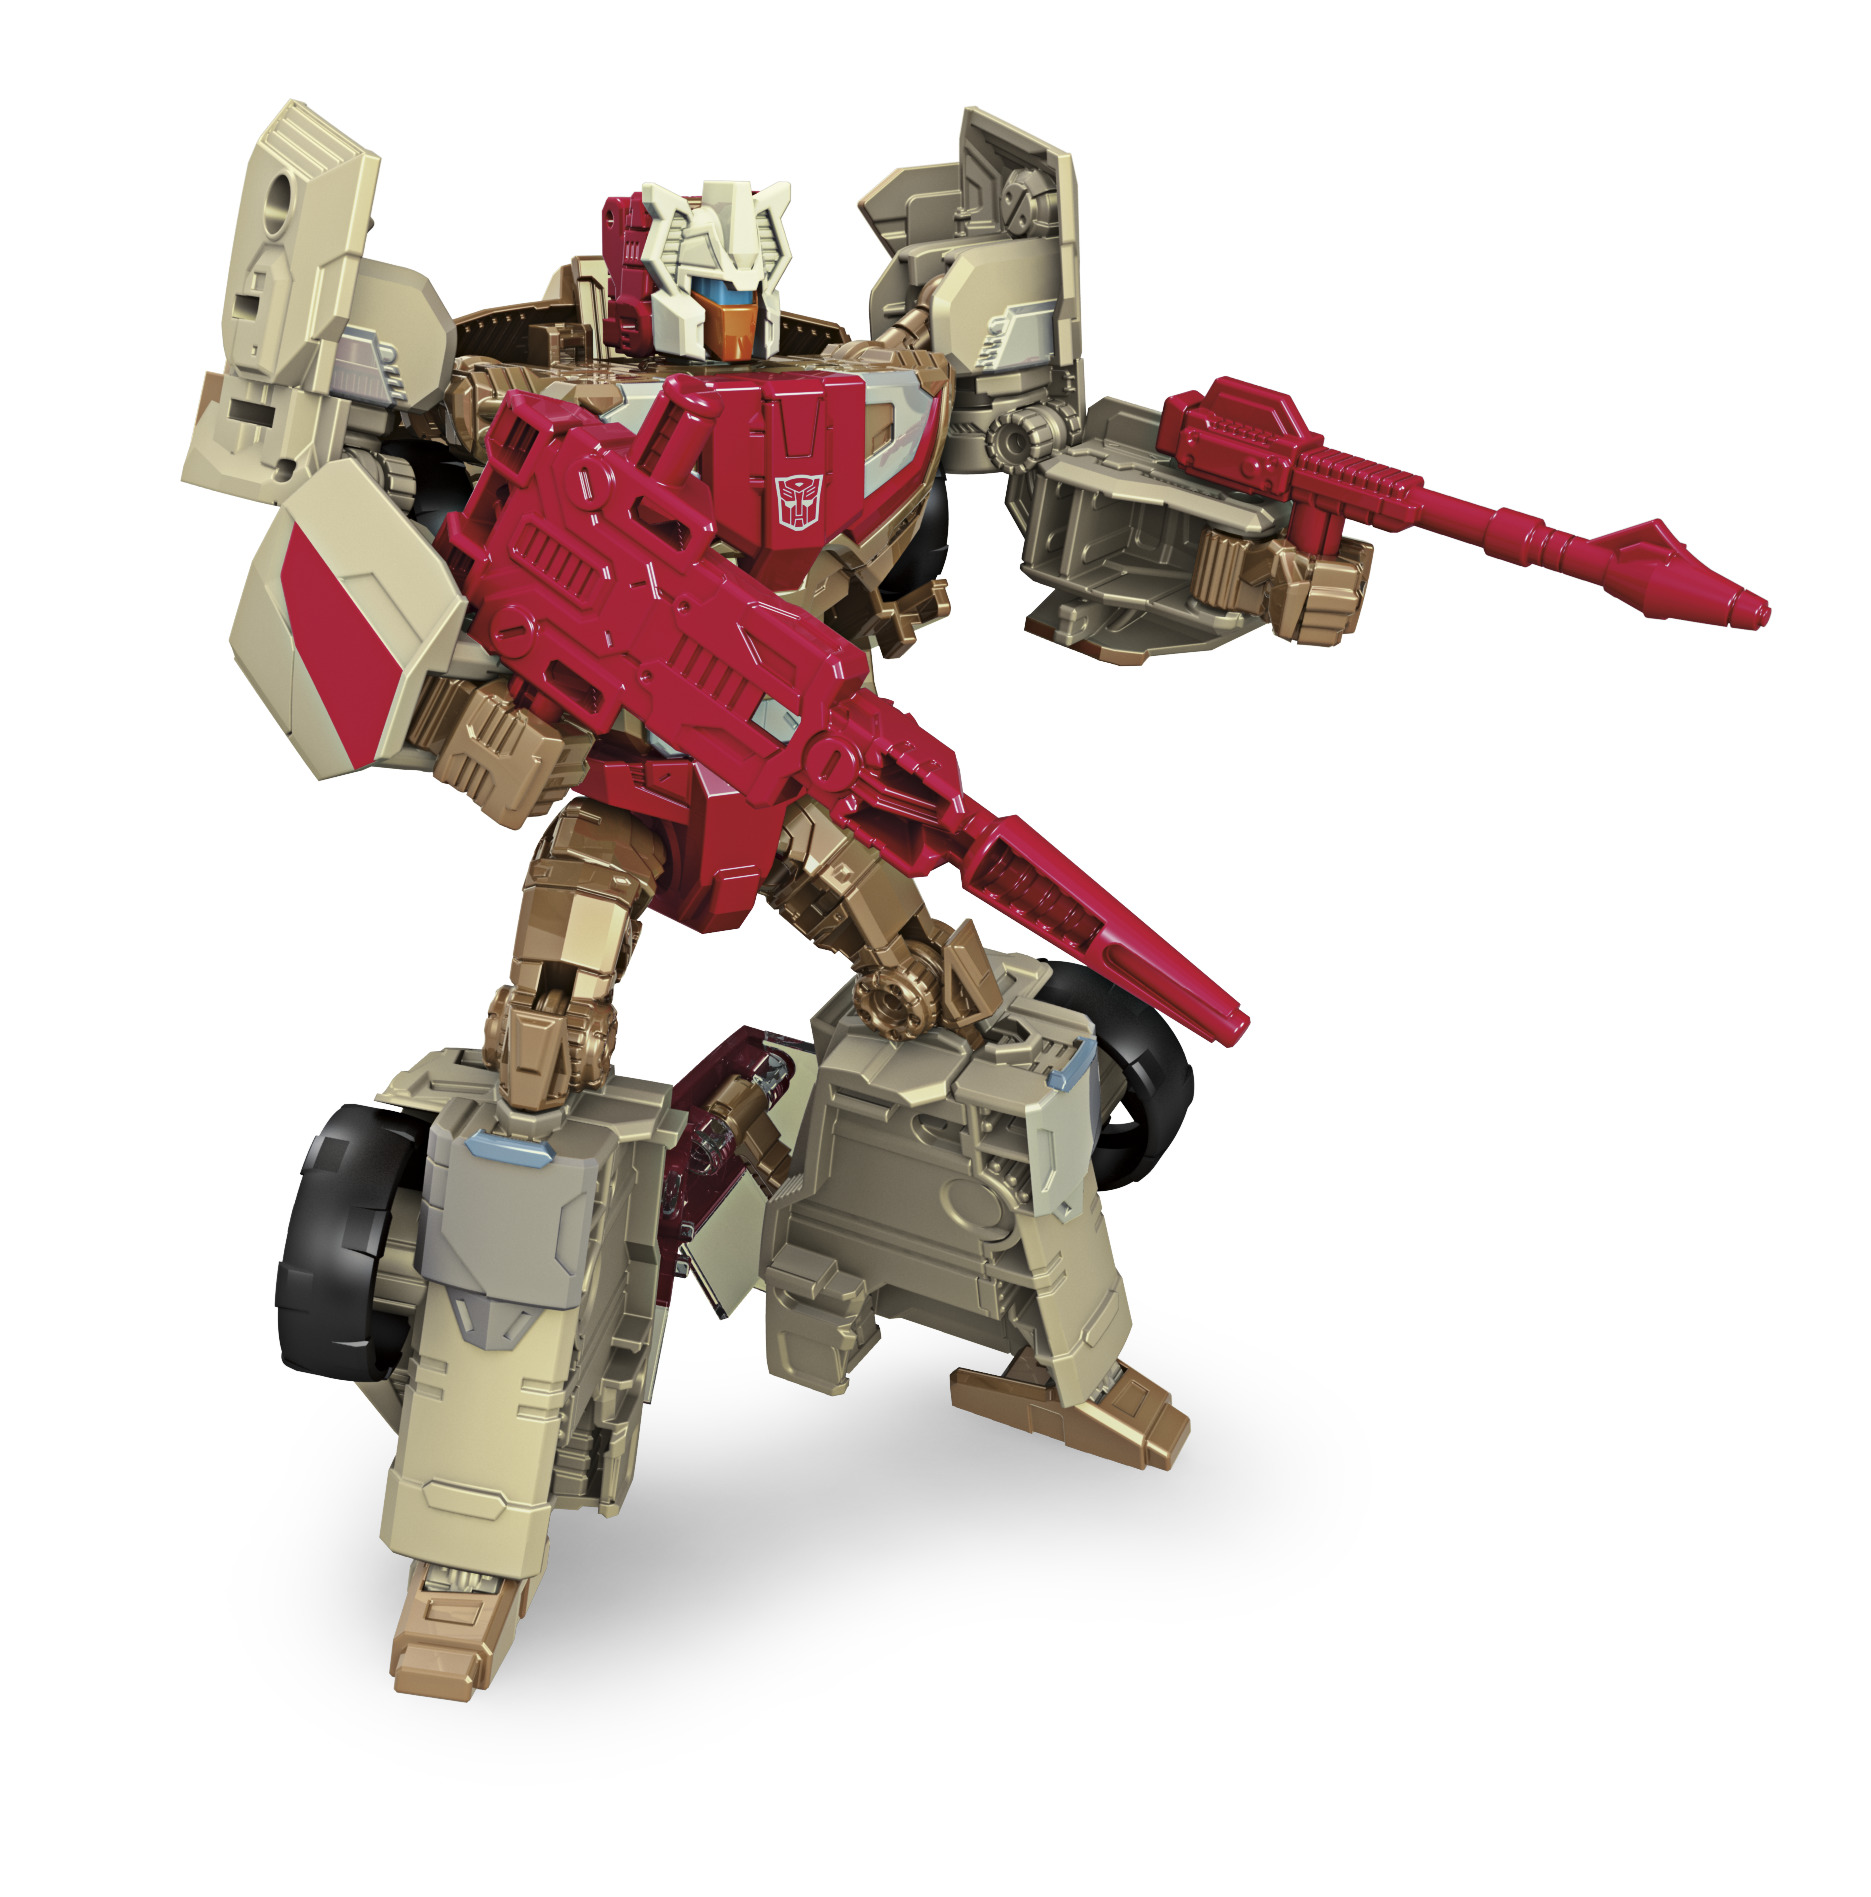 Chromedome Robot